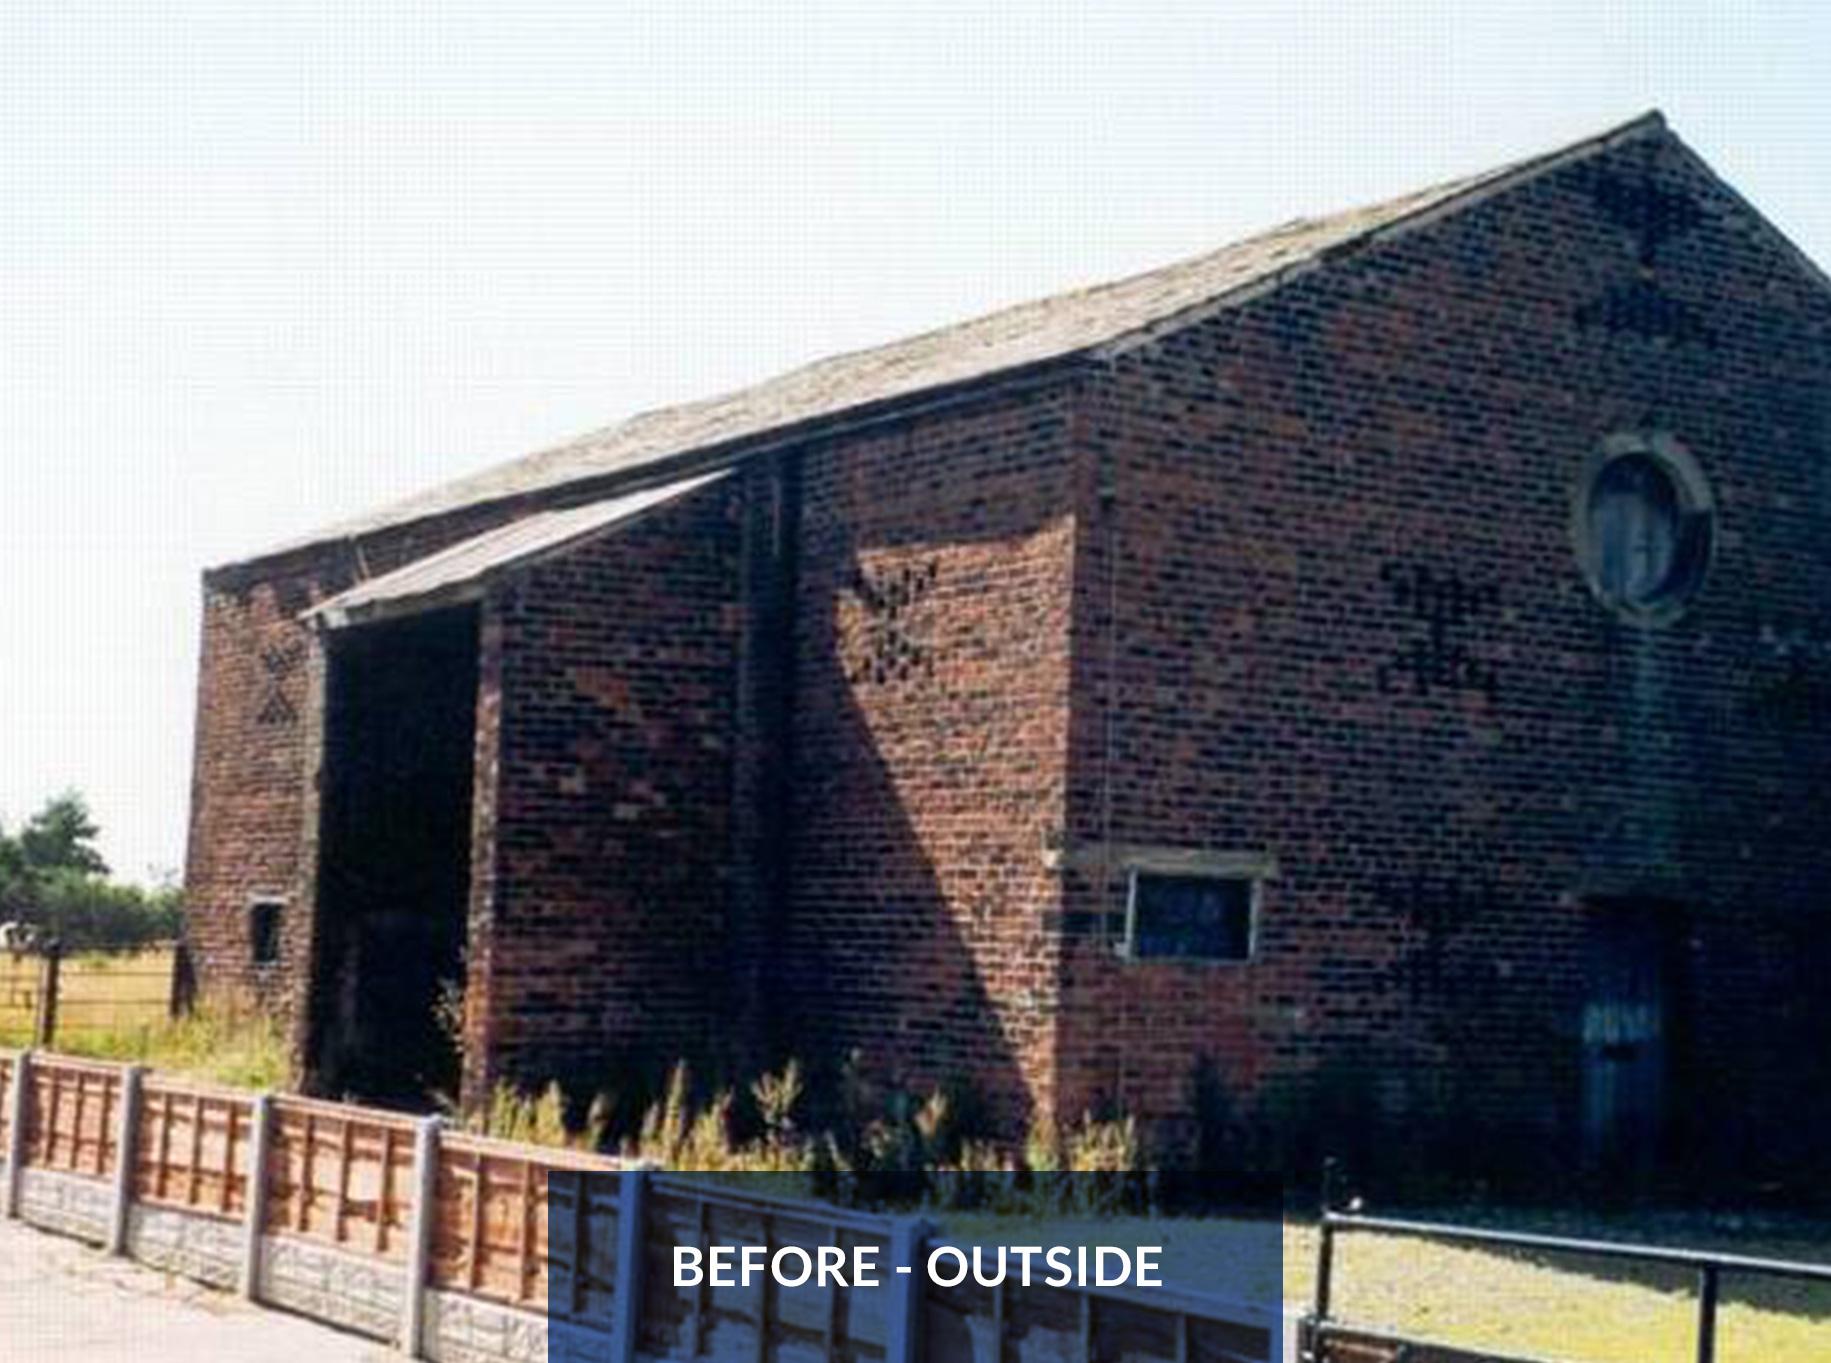 Leyland Bridge Barn - Before Outside